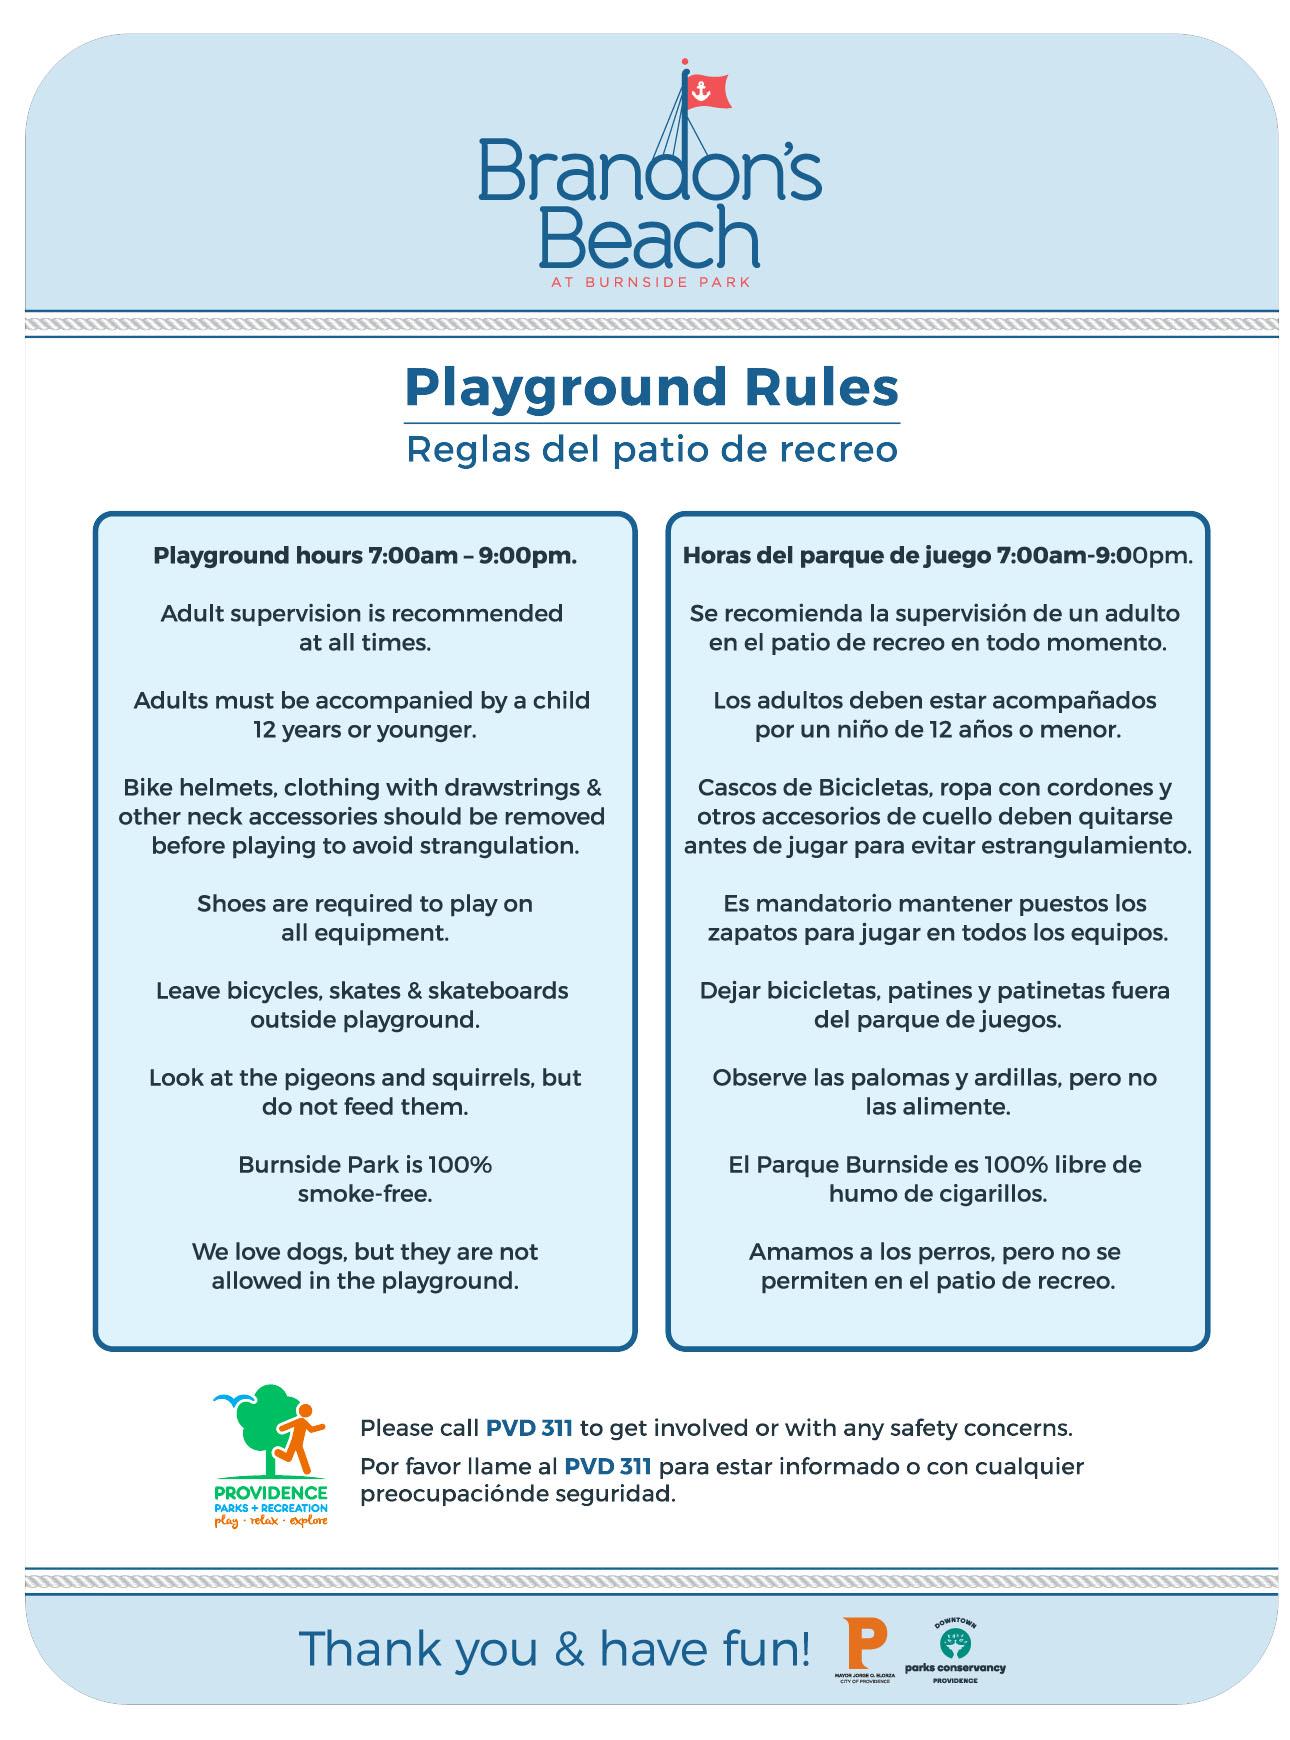 burnside park playground downtown providence parks conservancy dppc